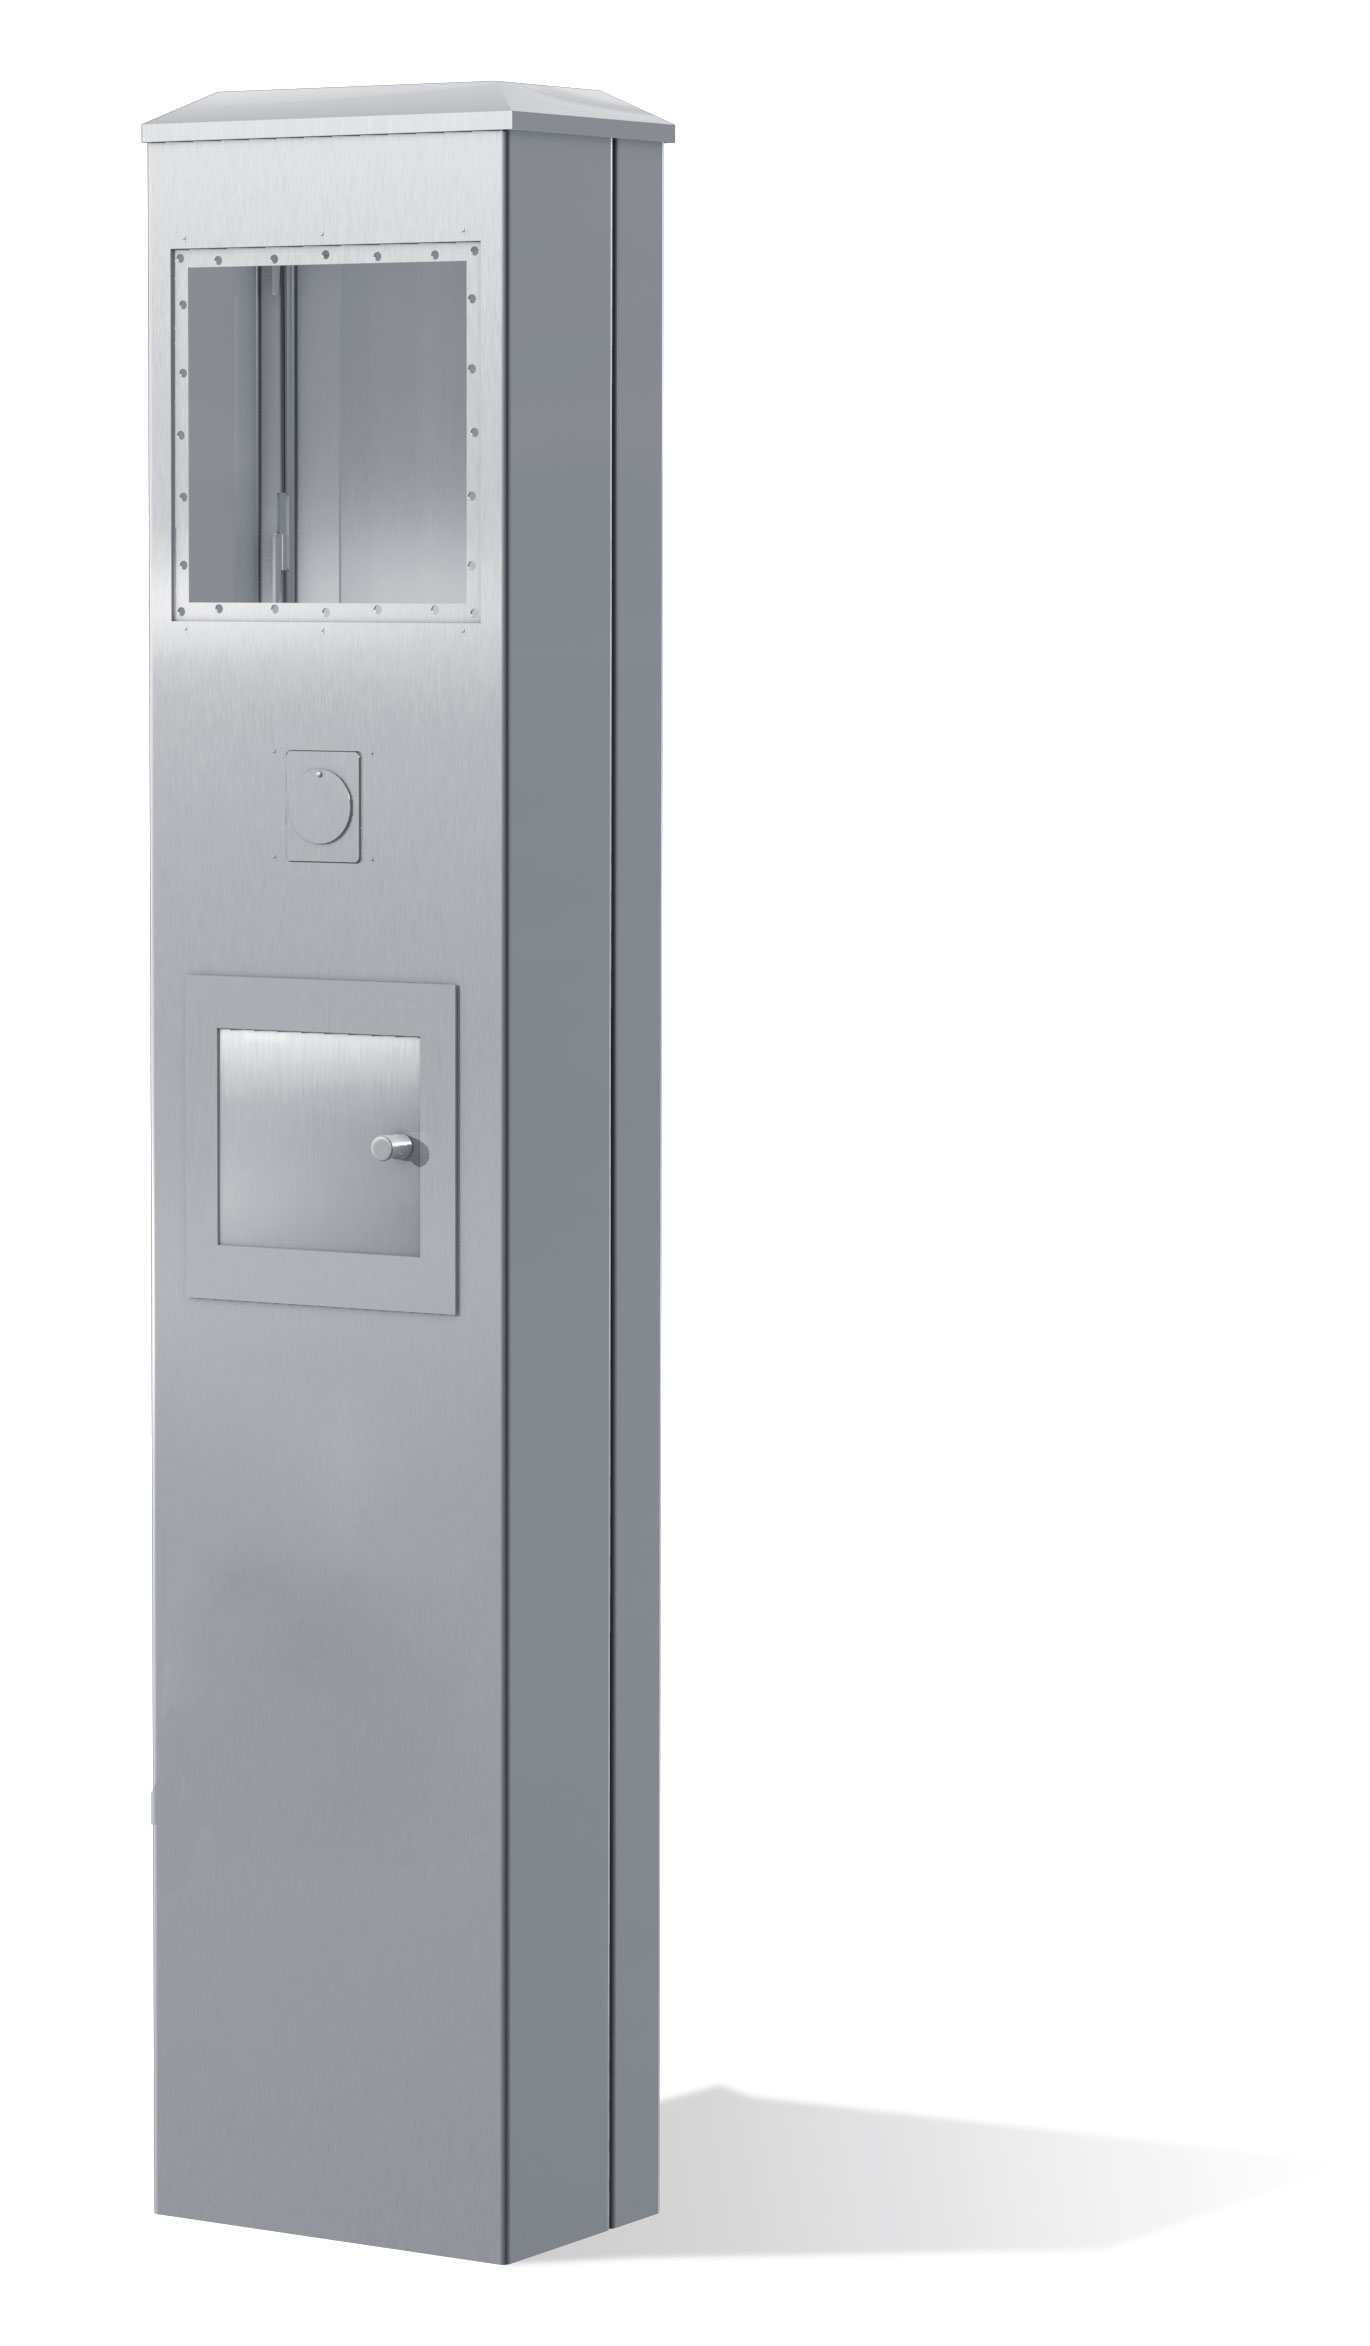 Produktbild KRUSE EdelstahlSäule K5-Flex